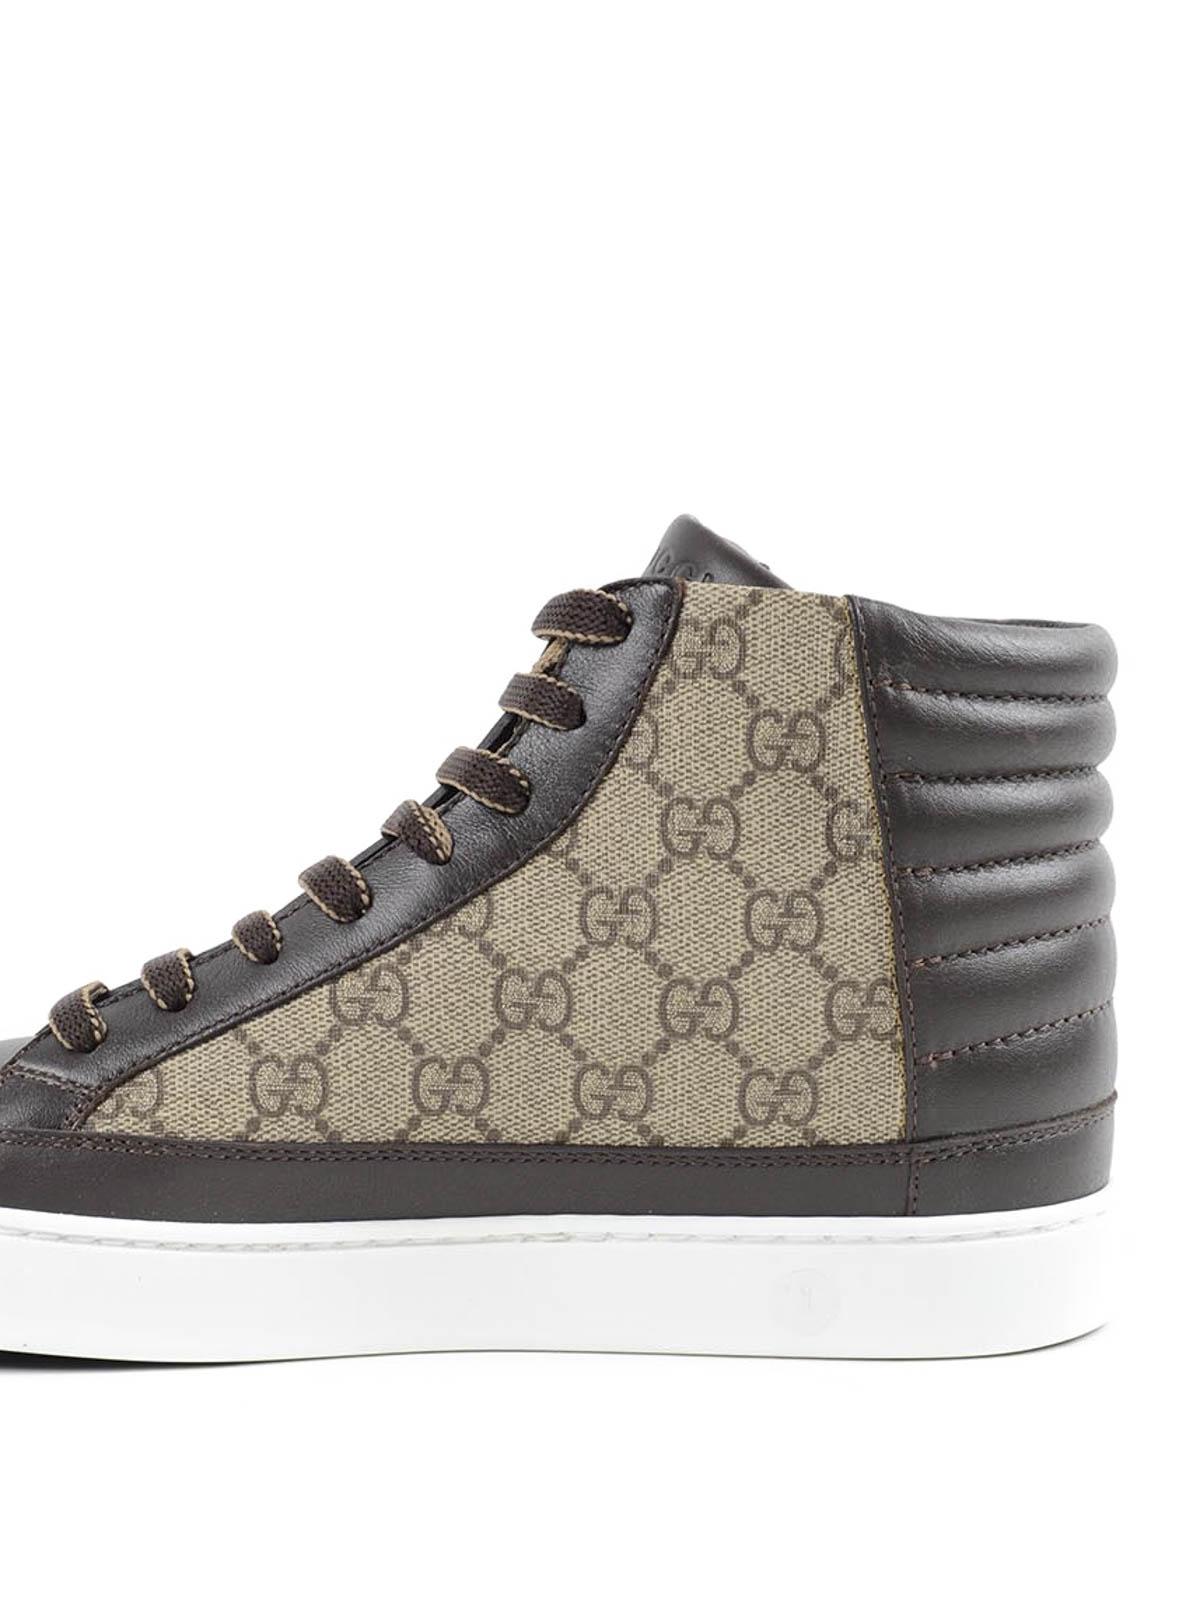 Gucci schuhe herren online shop